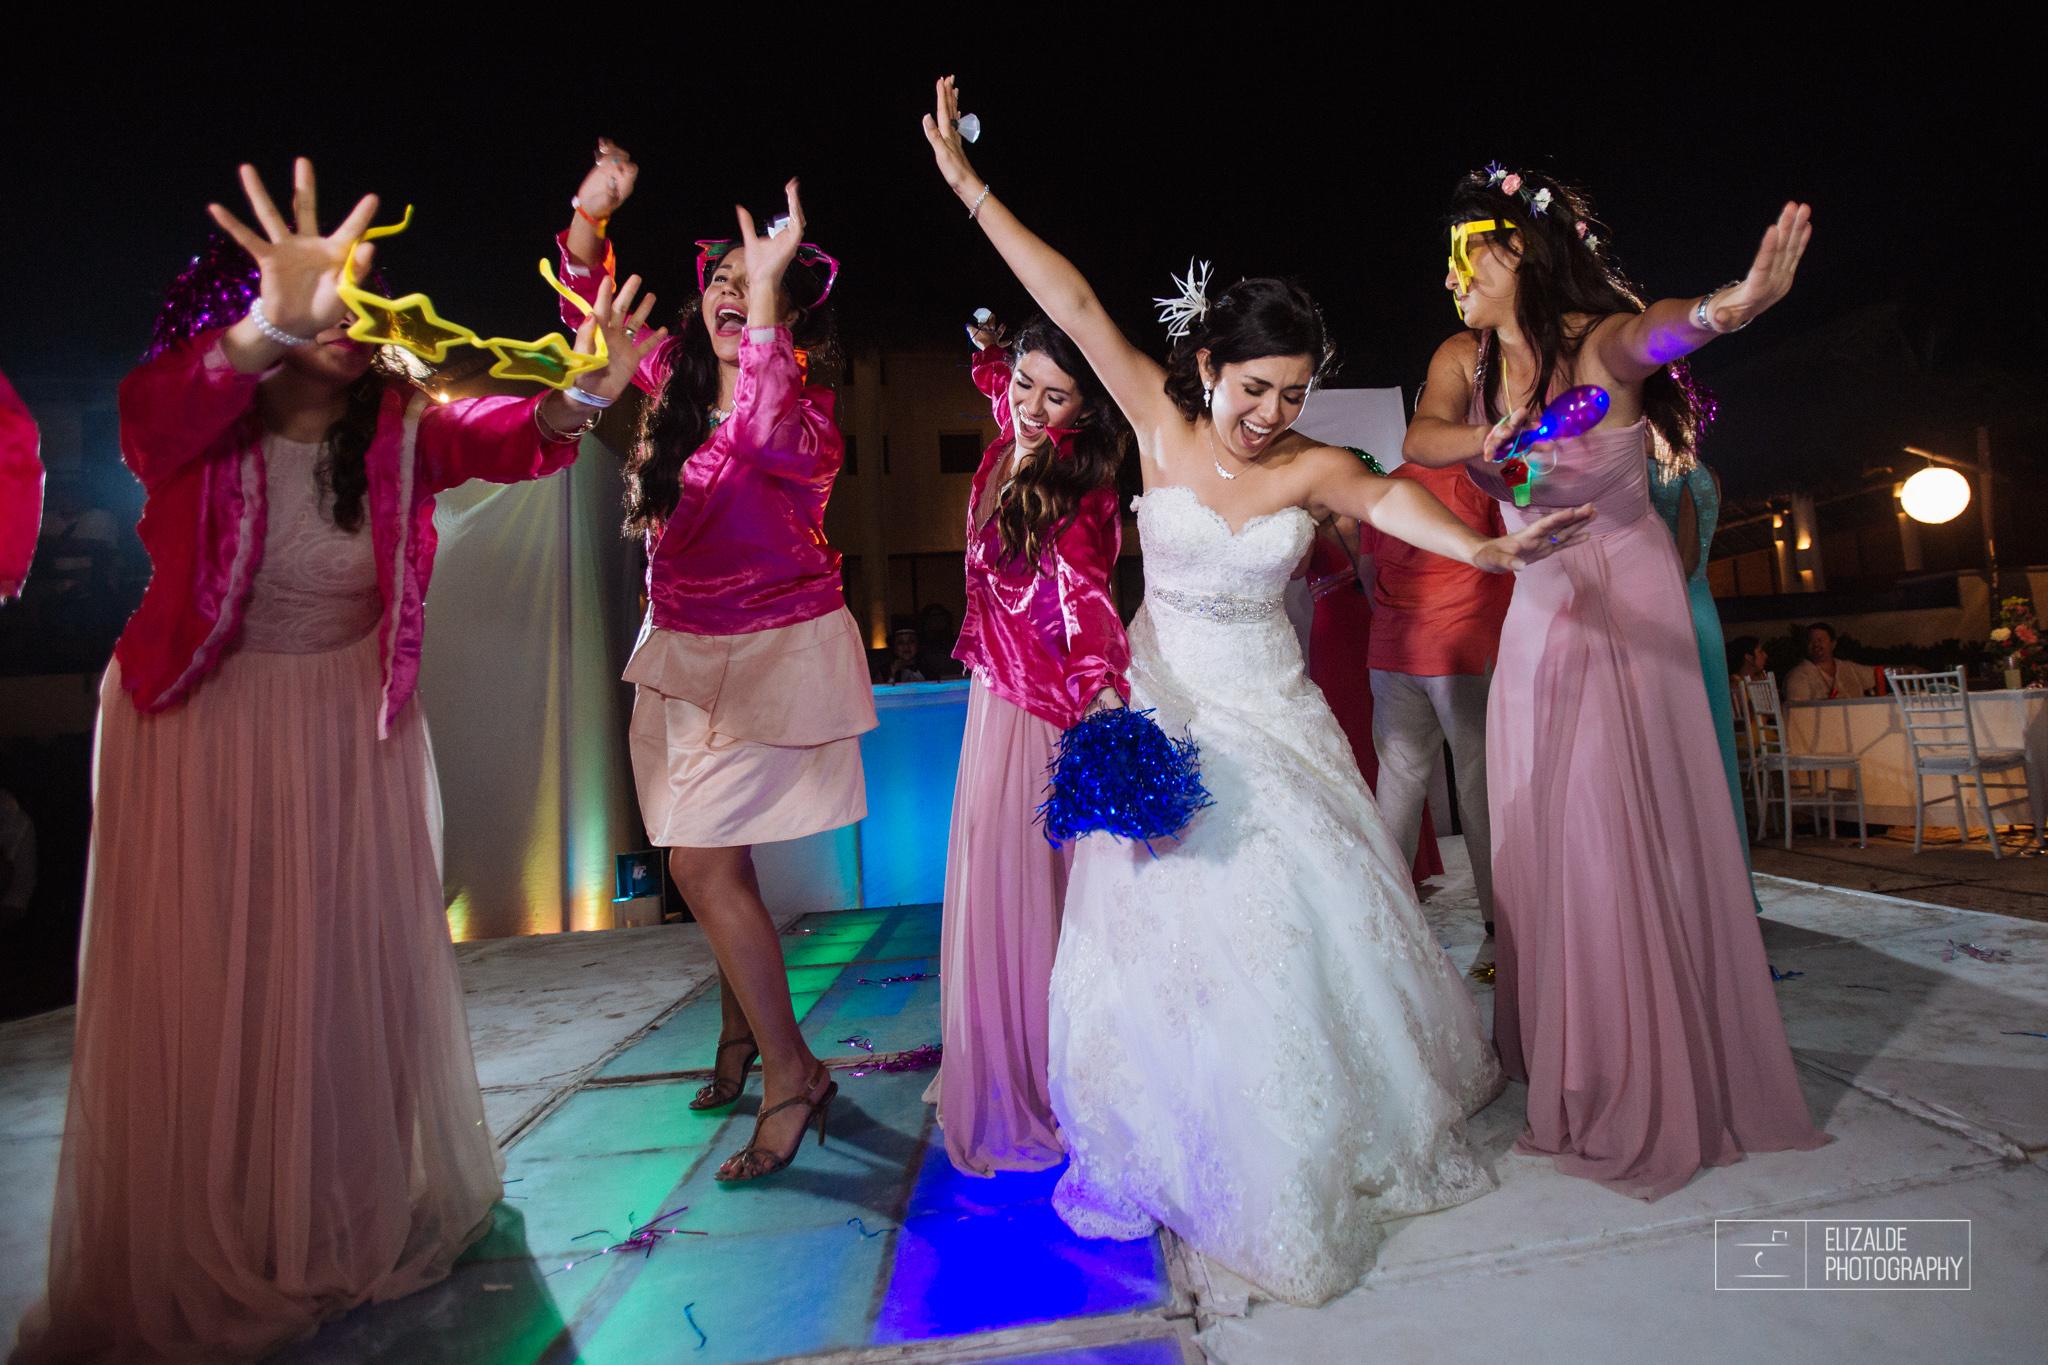 Pay and Ferran_Acapulco_Destination Wedding_Elizalde Photography-147.jpg